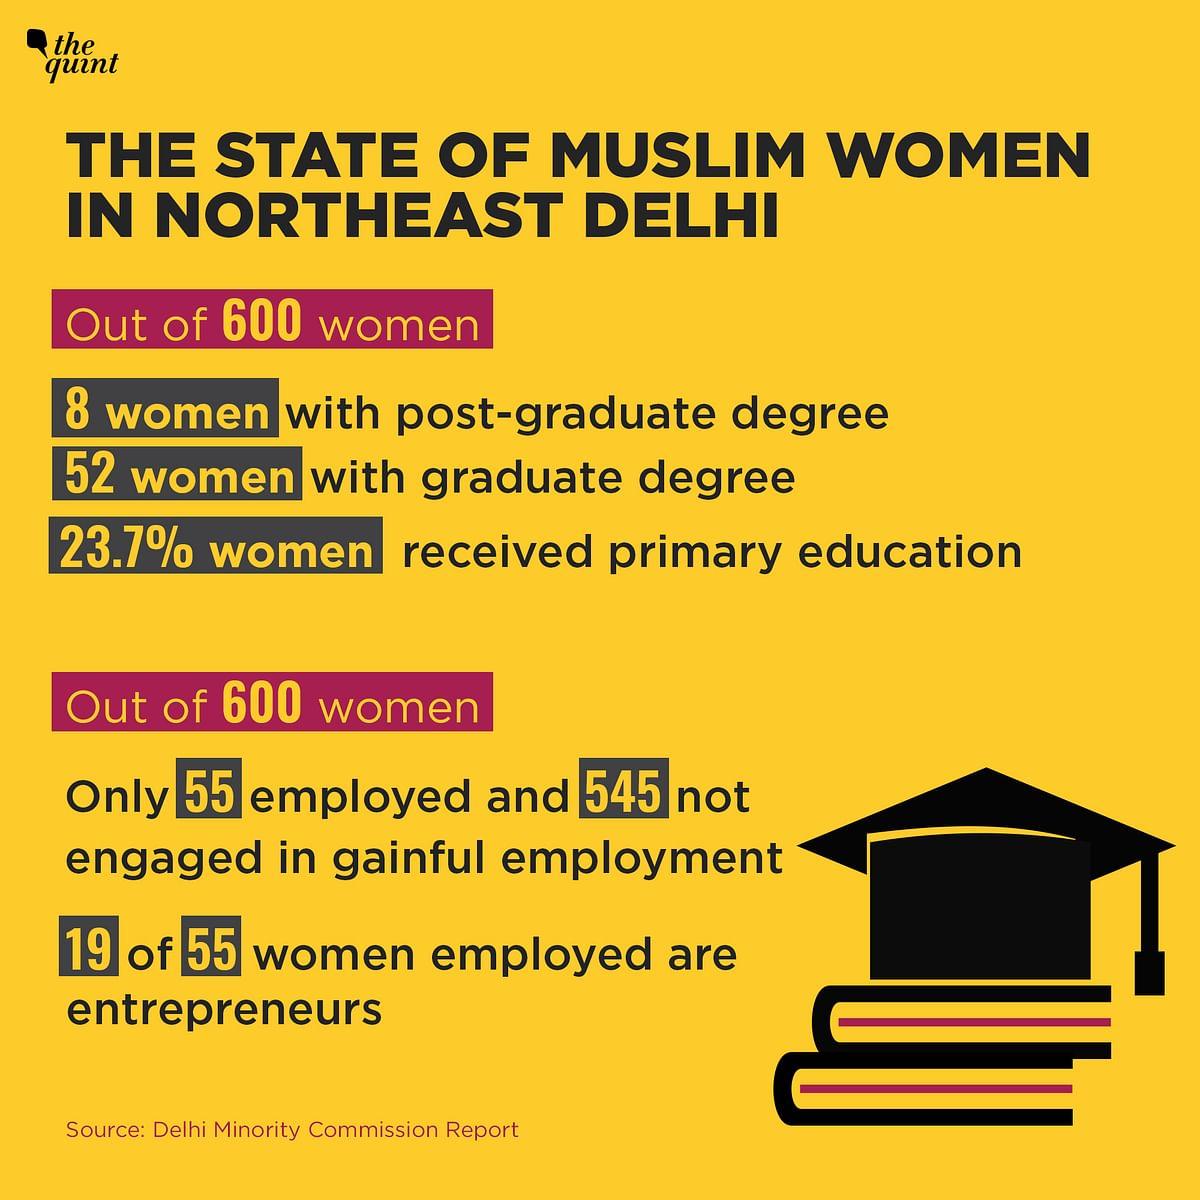 93% Muslim Women In NE Delhi Favour Triple Talaq Verdict: Study